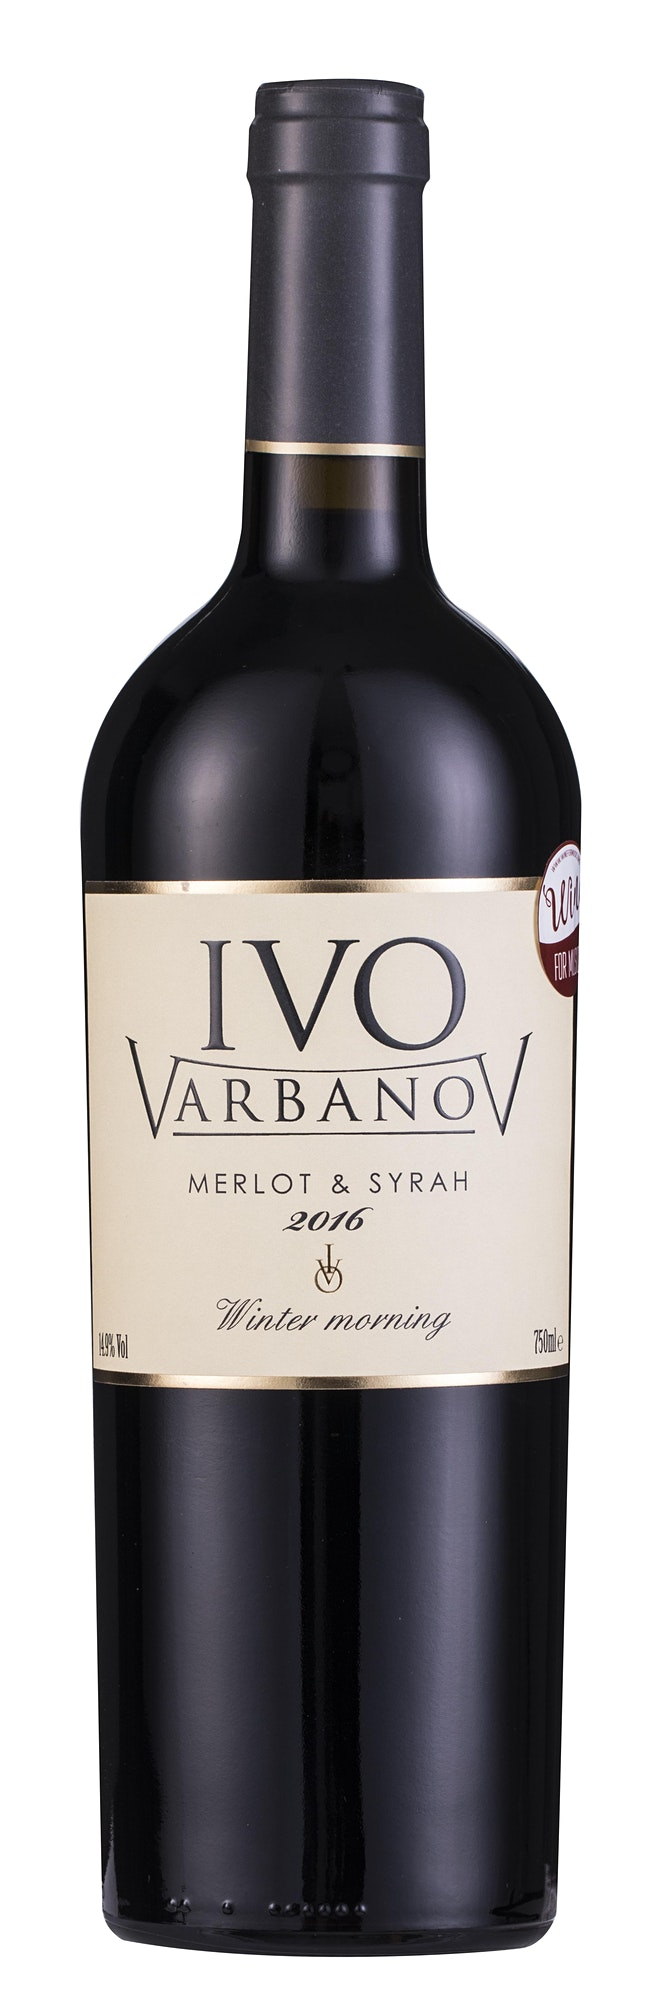 IVO VARBANOV WINES – VIRTUAL WINE TASTING image